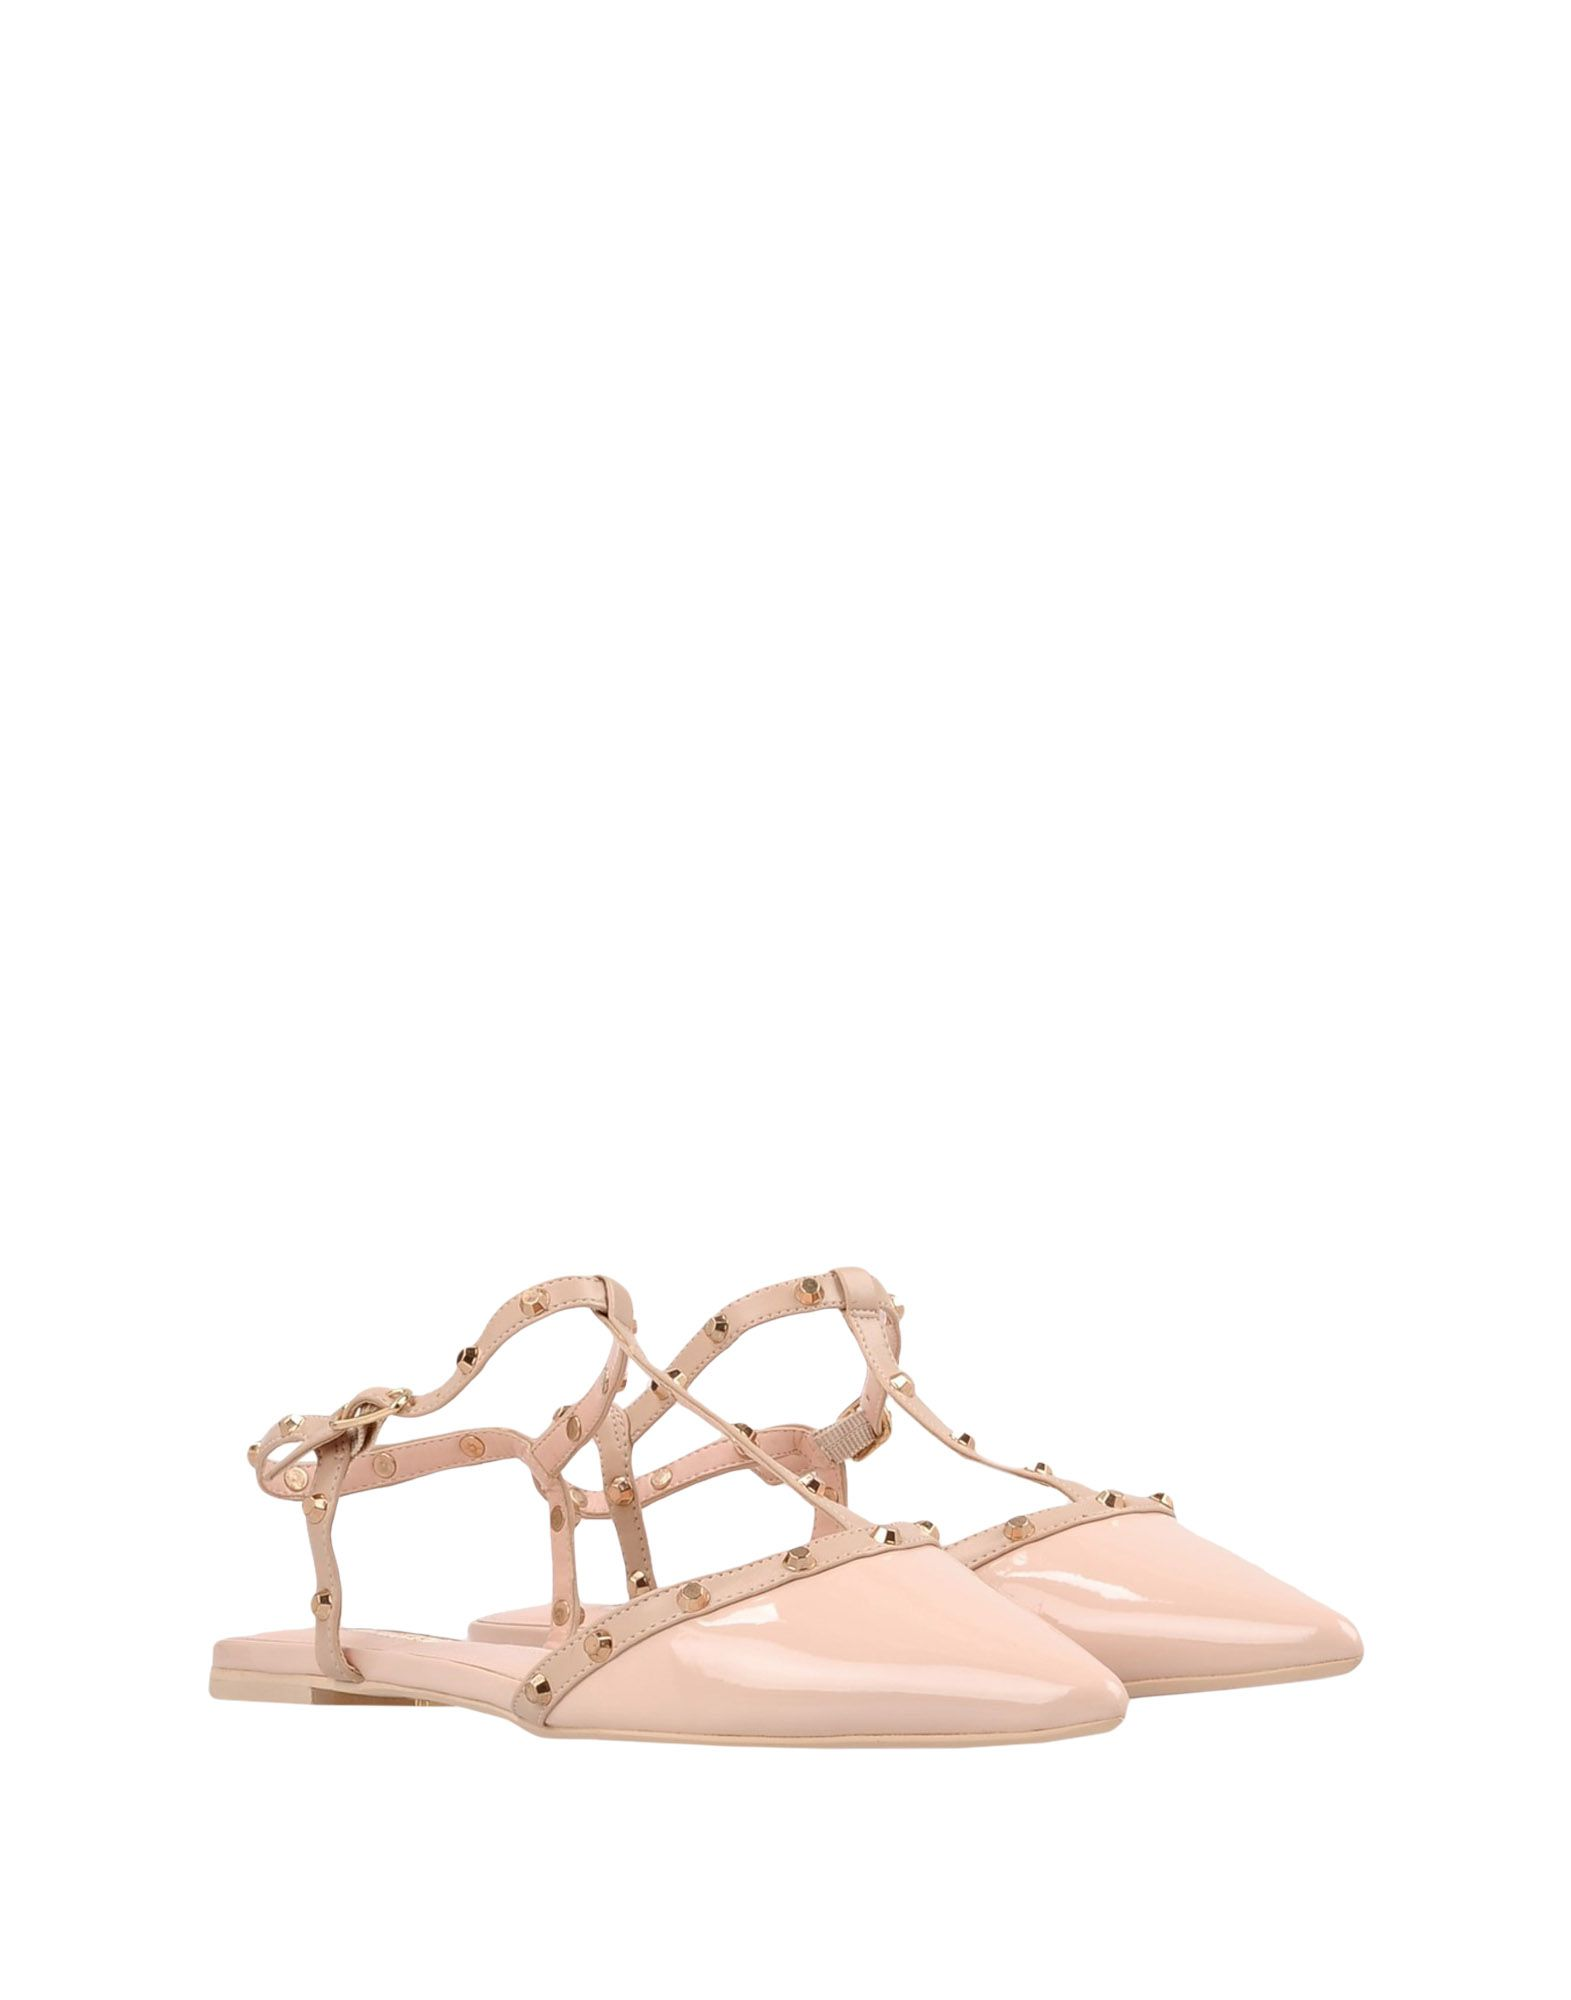 Dune London Ballerinas Damen  11419976CX Gute Qualität beliebte Schuhe